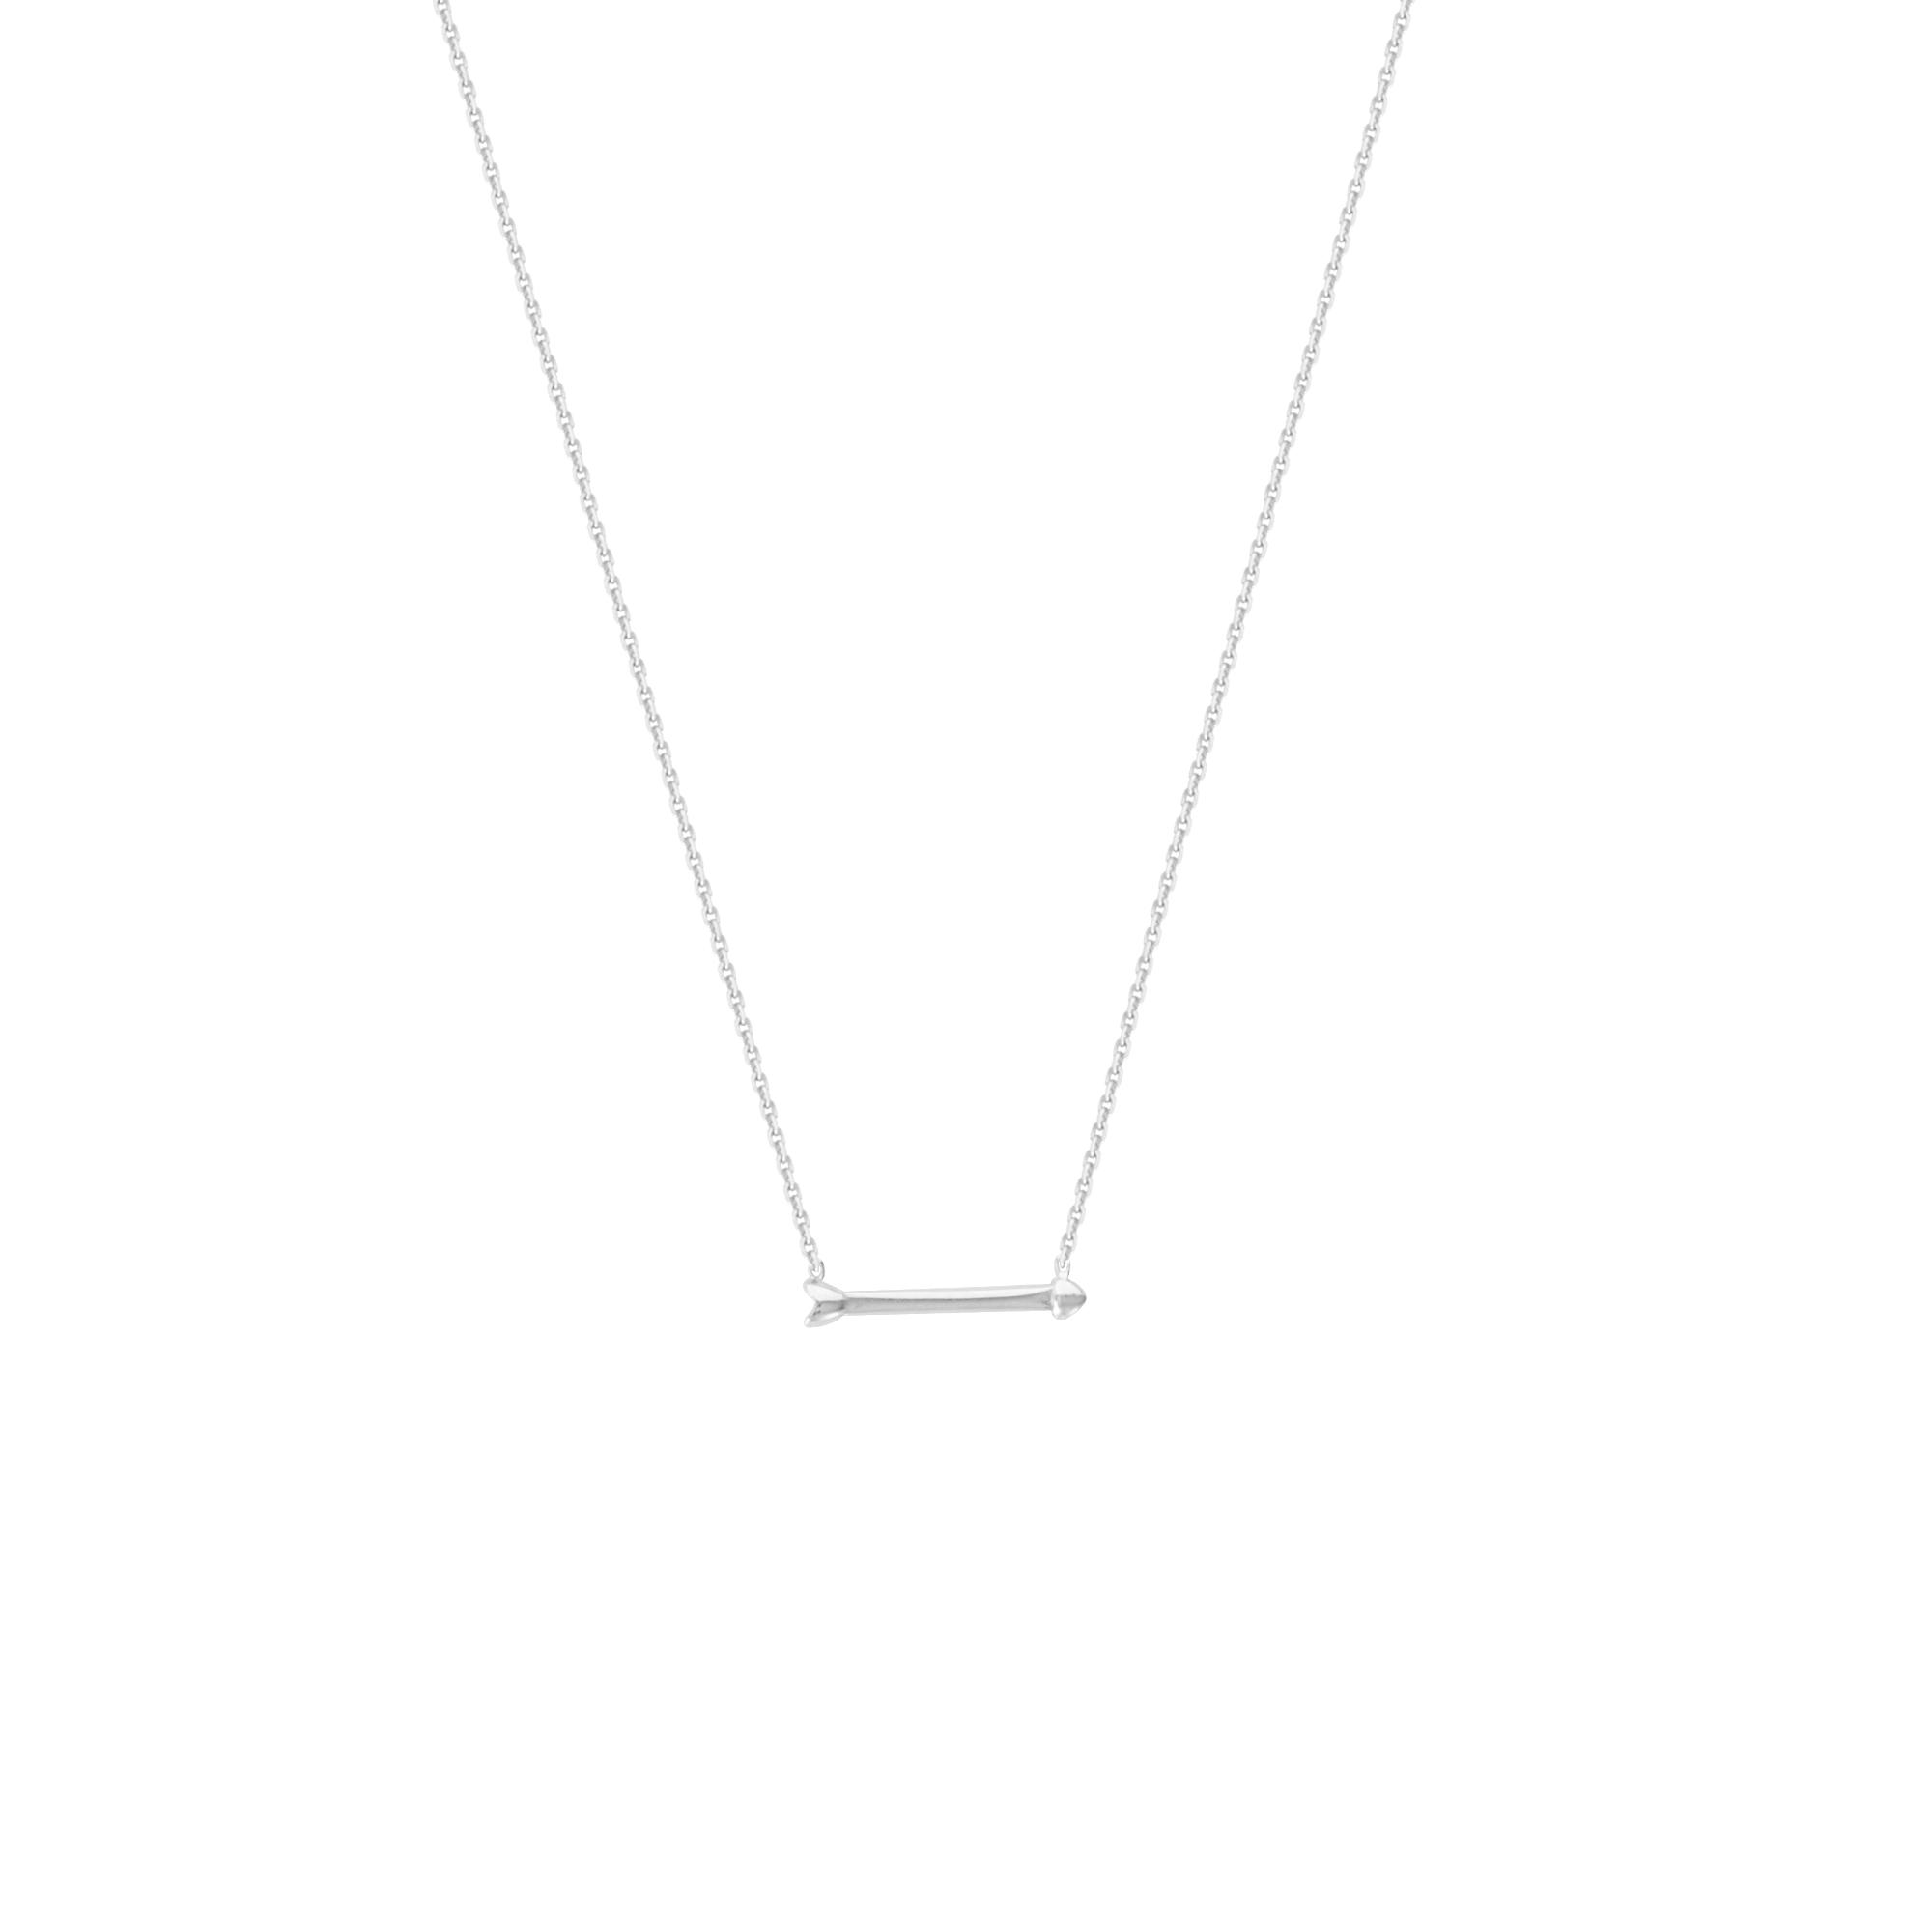 Arrow Necklace, 14 Kt Gold  Arrow Necklace 18